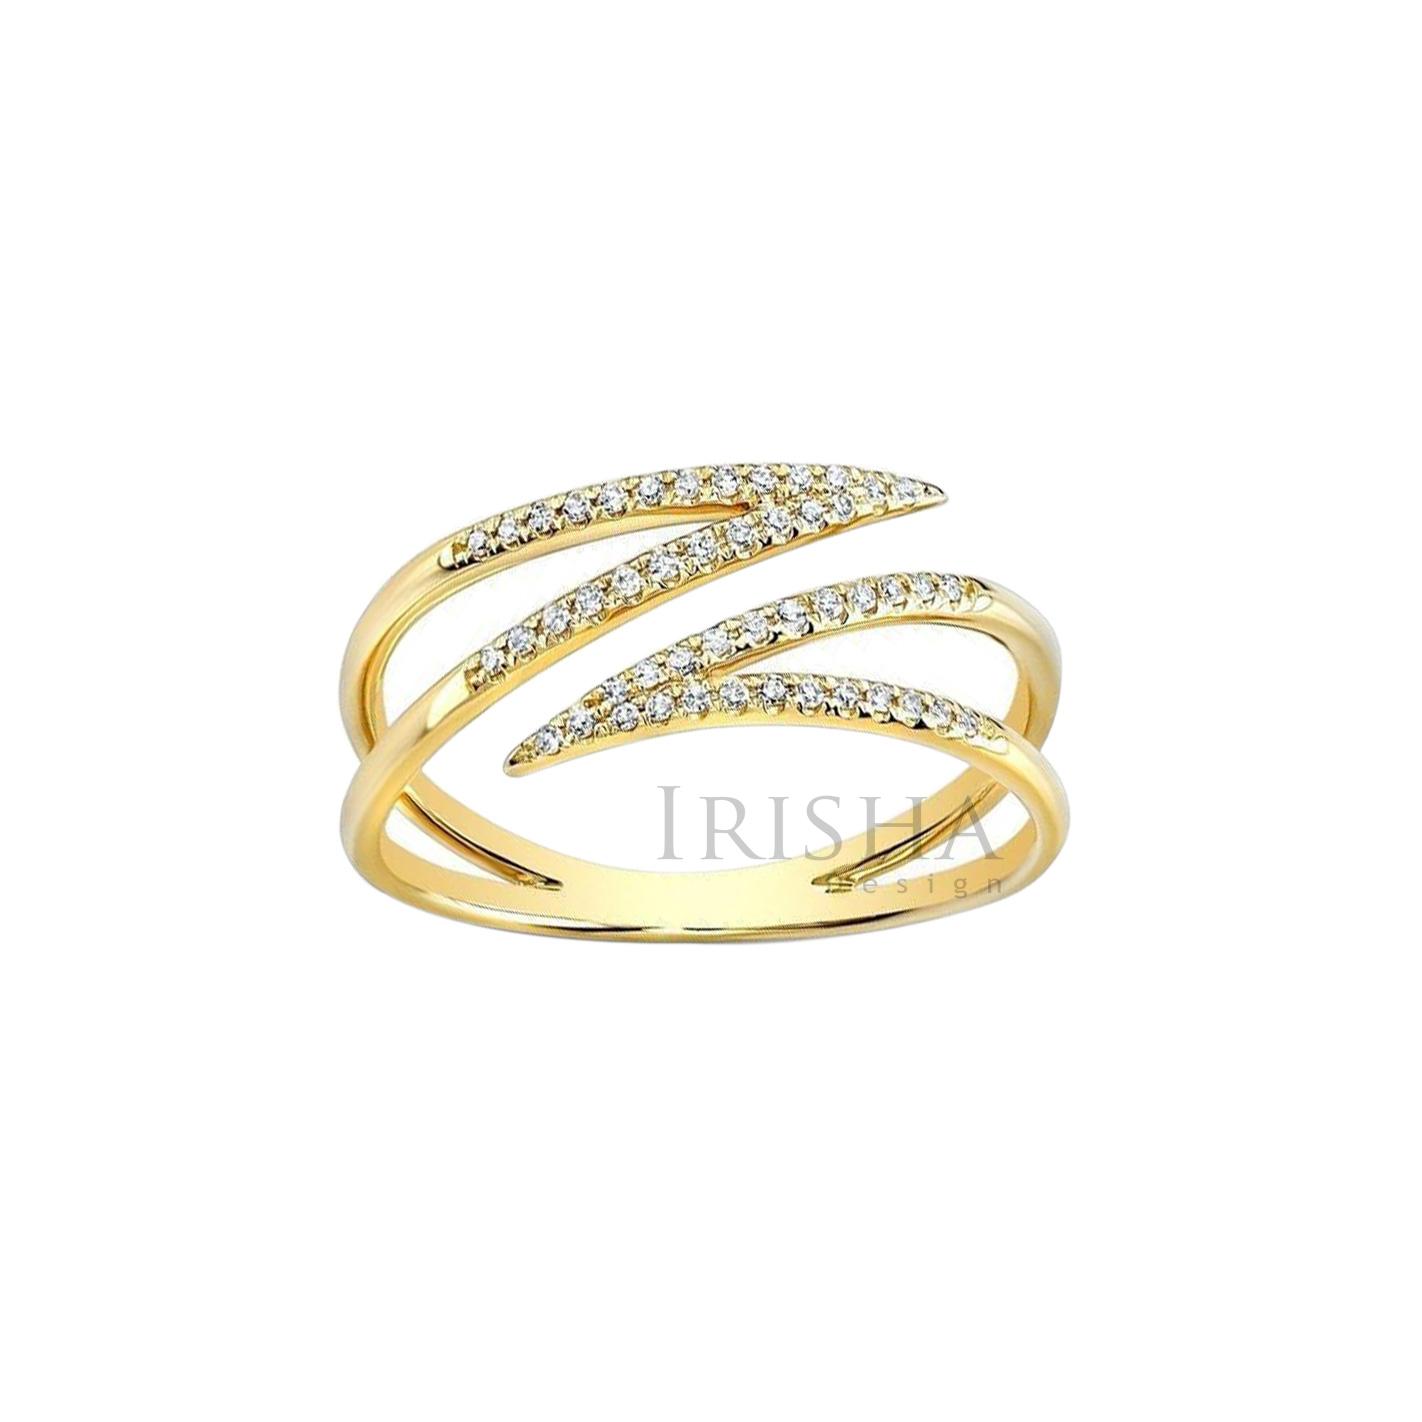 14K Gold Natural Diamond Cuff Design Ring Handmade Fine Jewelry